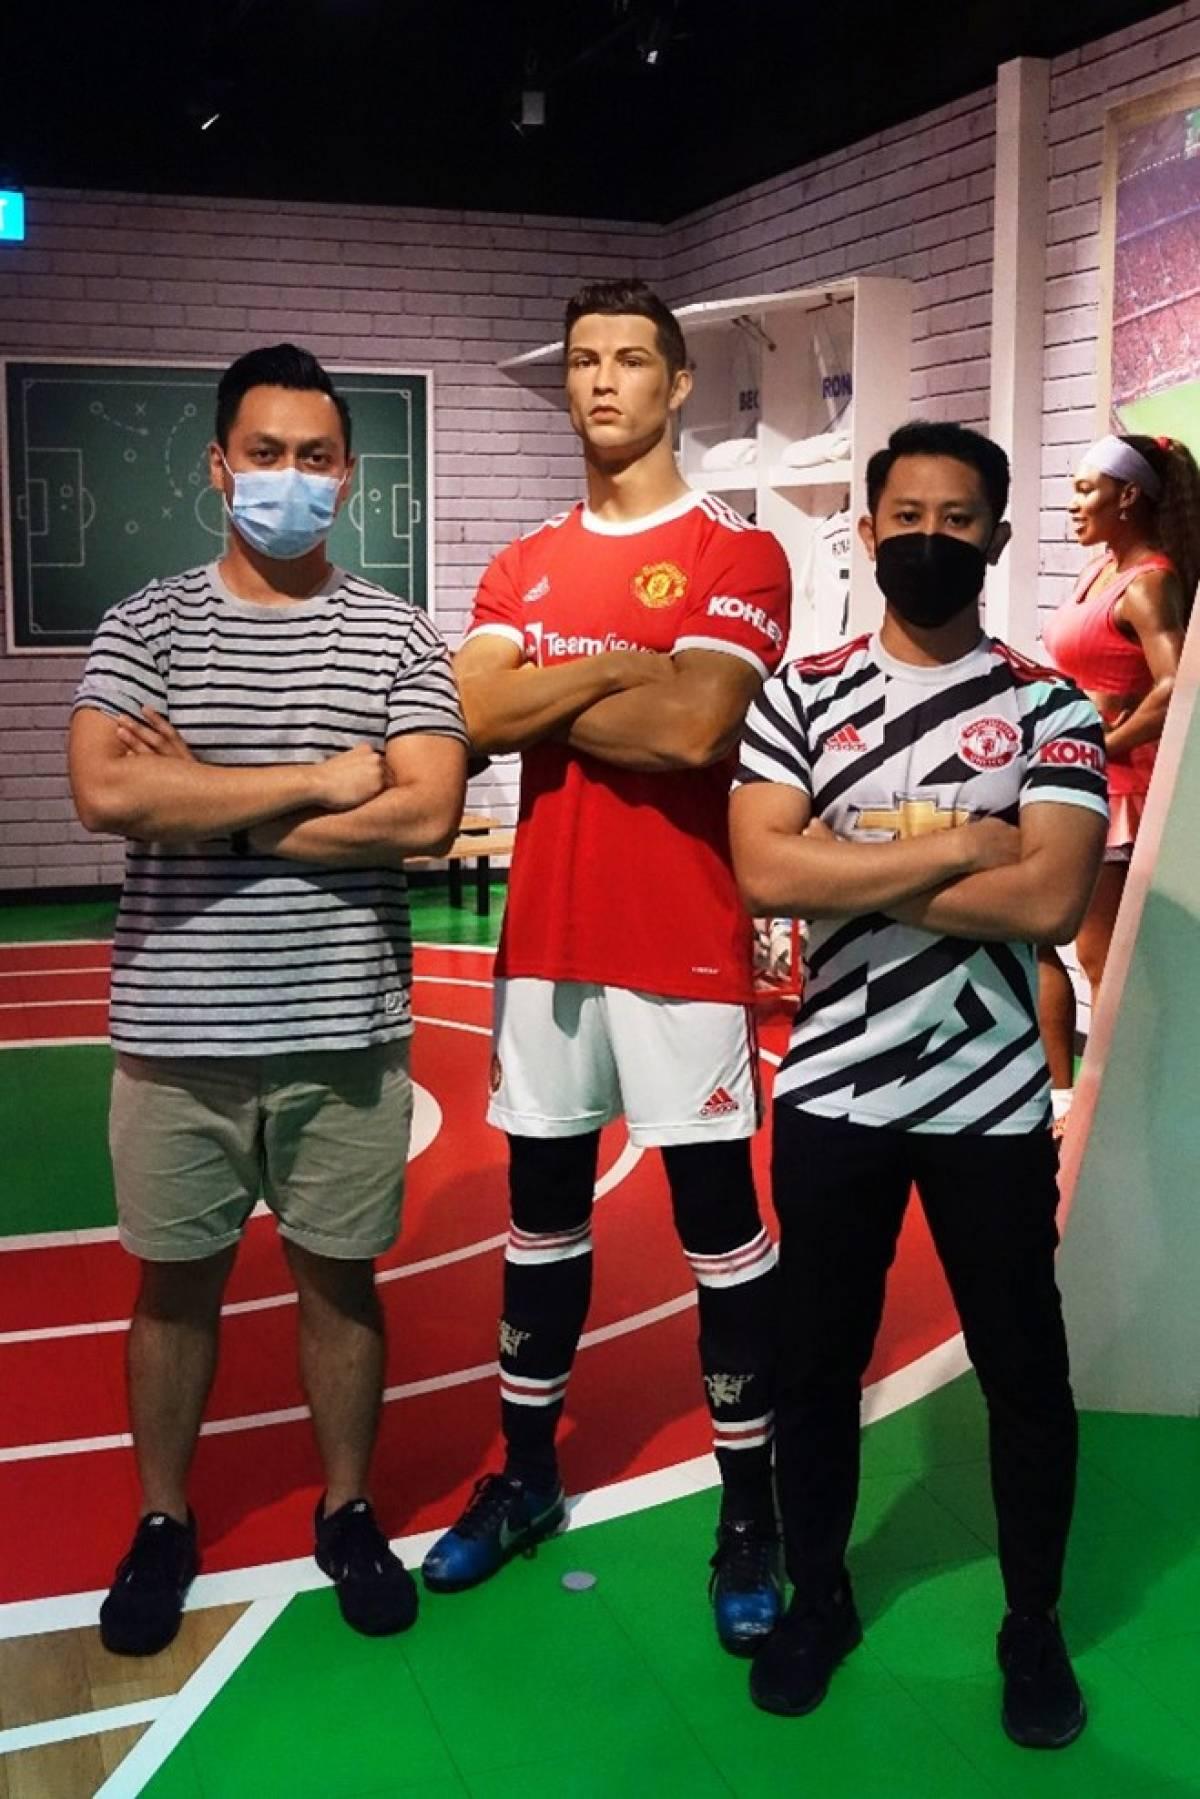 Madame Tussauds Singapore Celebrates the Return of Cristiano Ronaldo to Manchester United